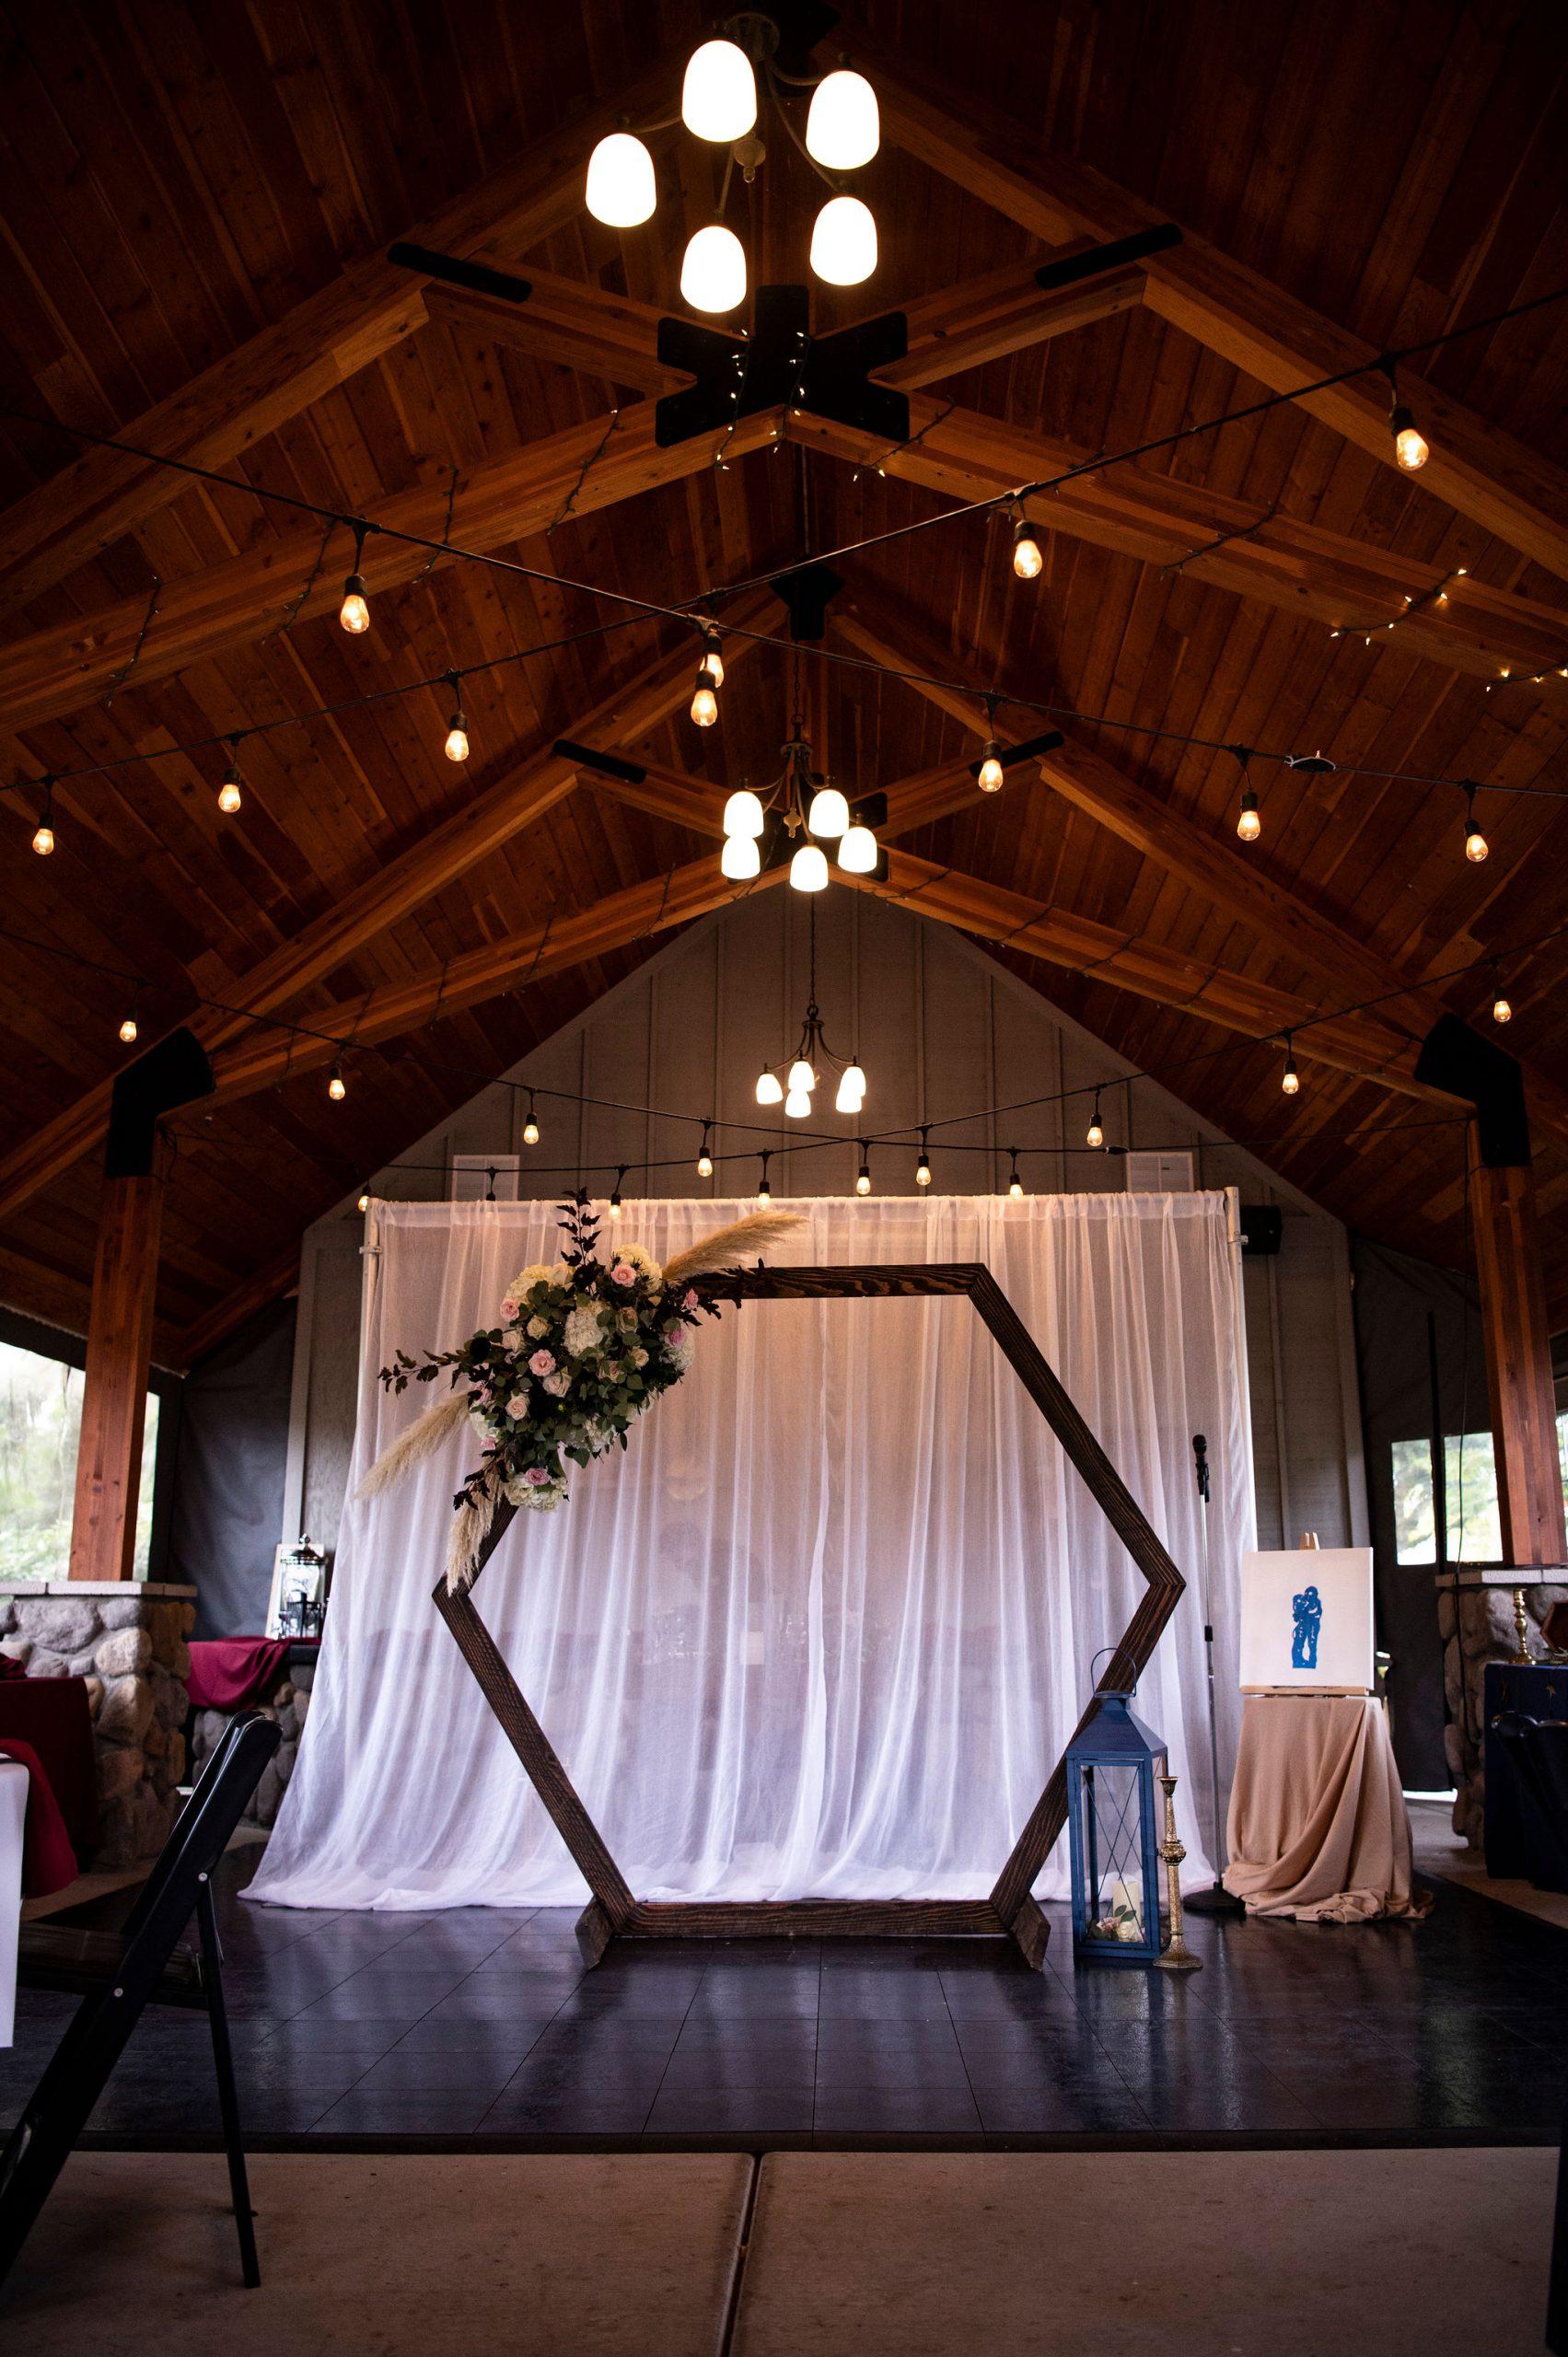 wedding arbor, hexagon arbor, sah-hah-lee wedding, indoor wedding